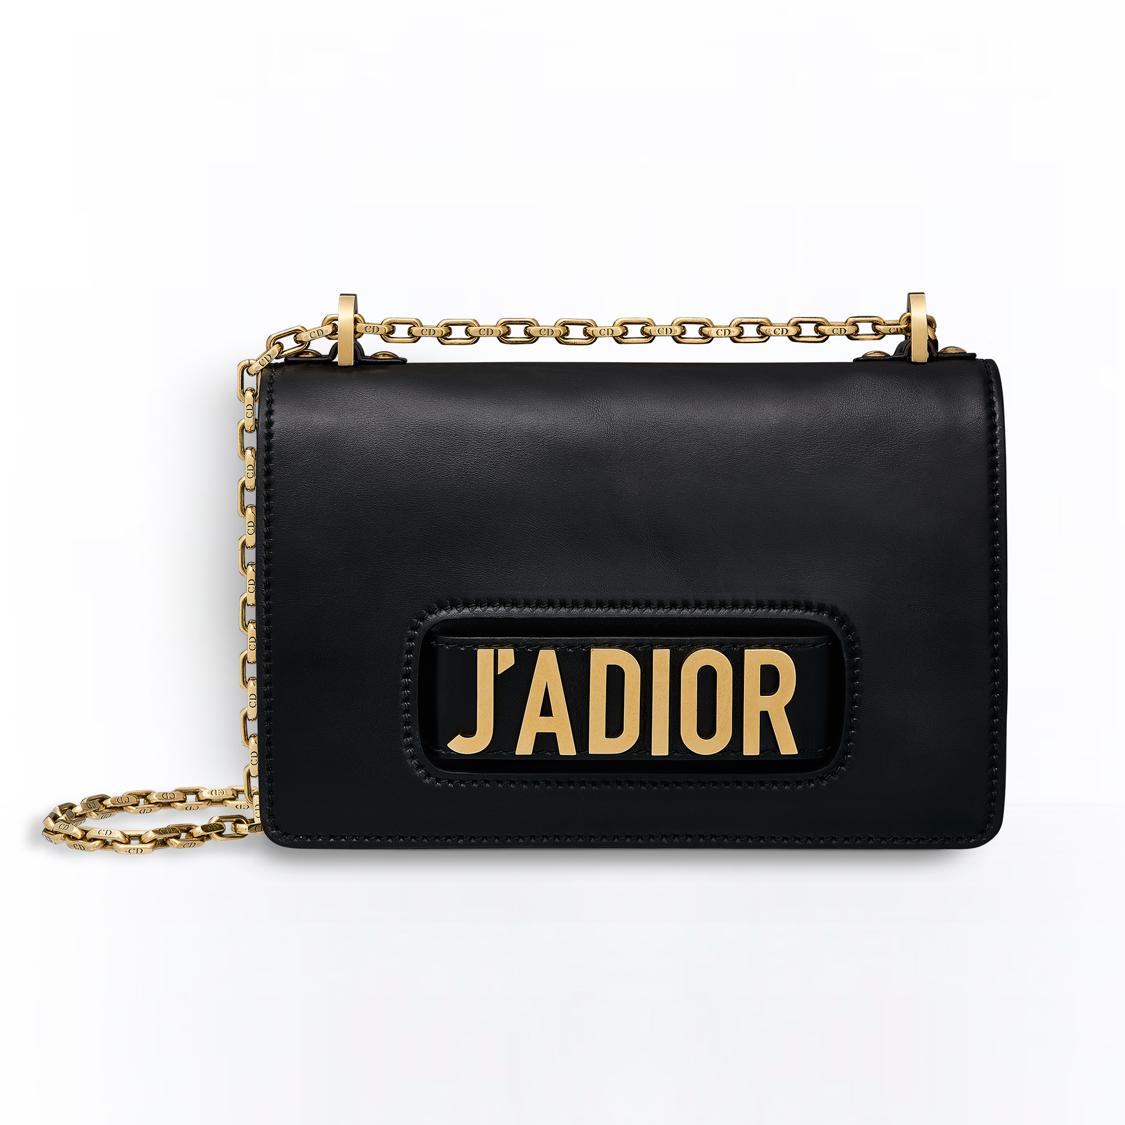 Dior J'adior black